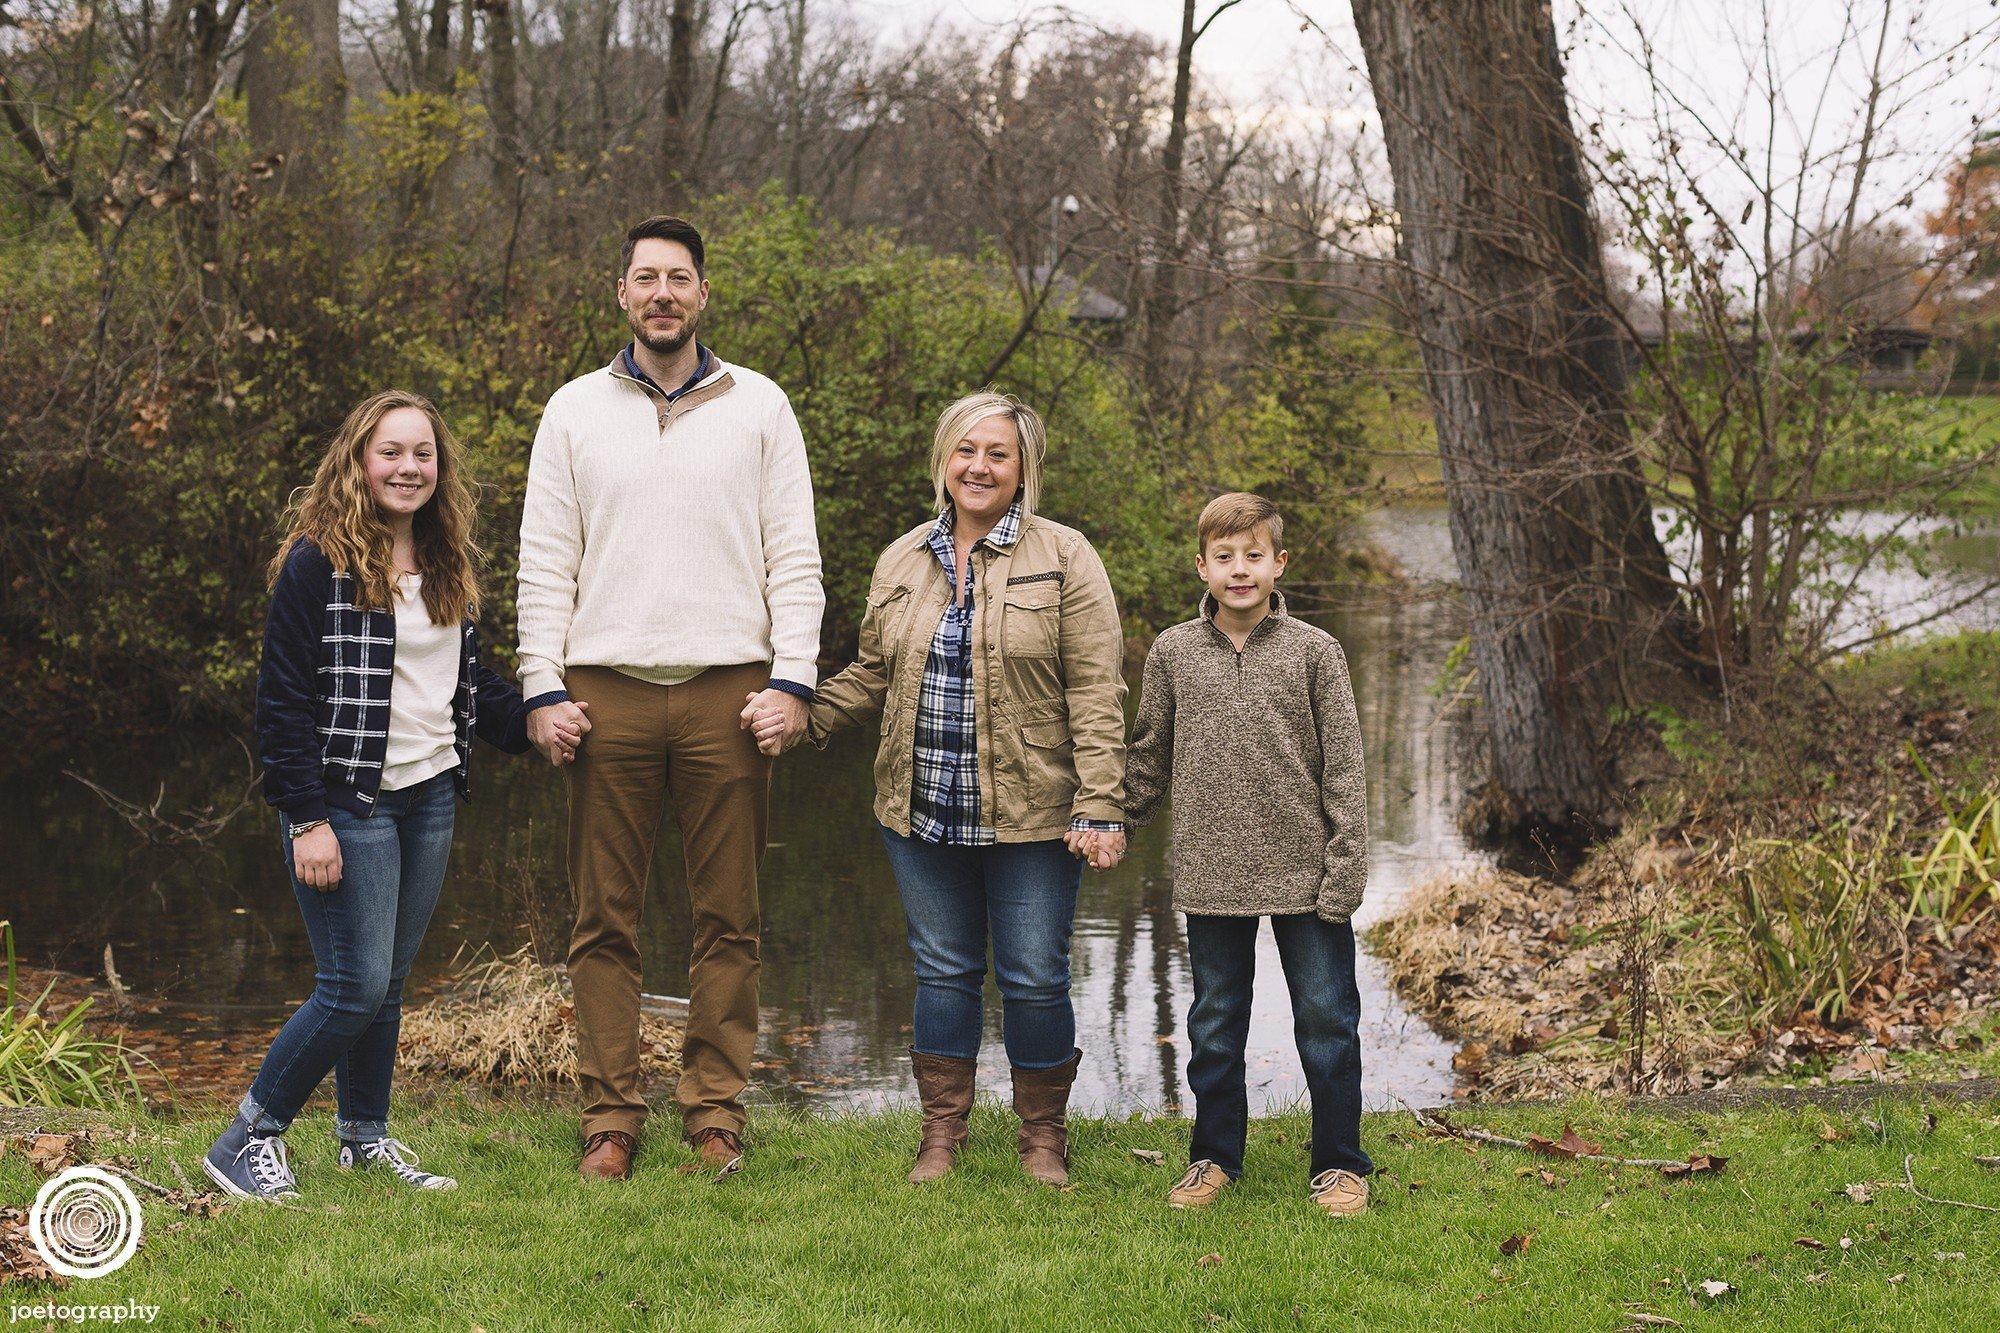 Teeple Family Photographs   Indianapolis - 12